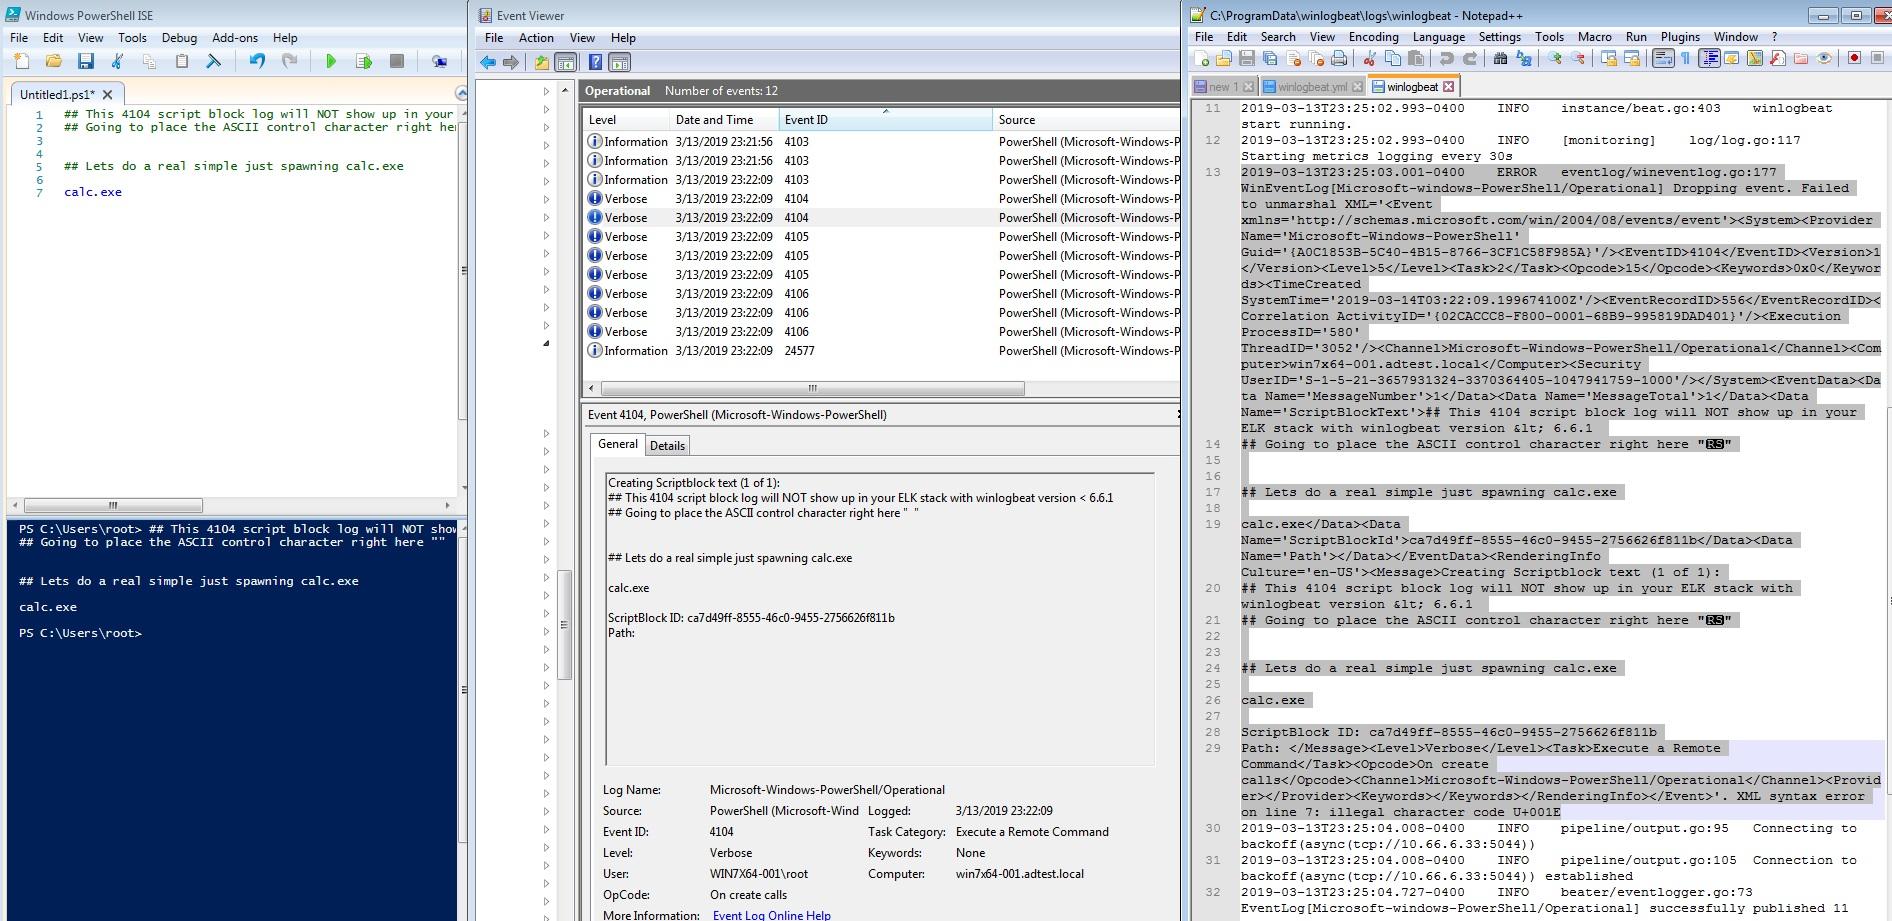 Powershell 4104 Scriptblock Logging Bypass